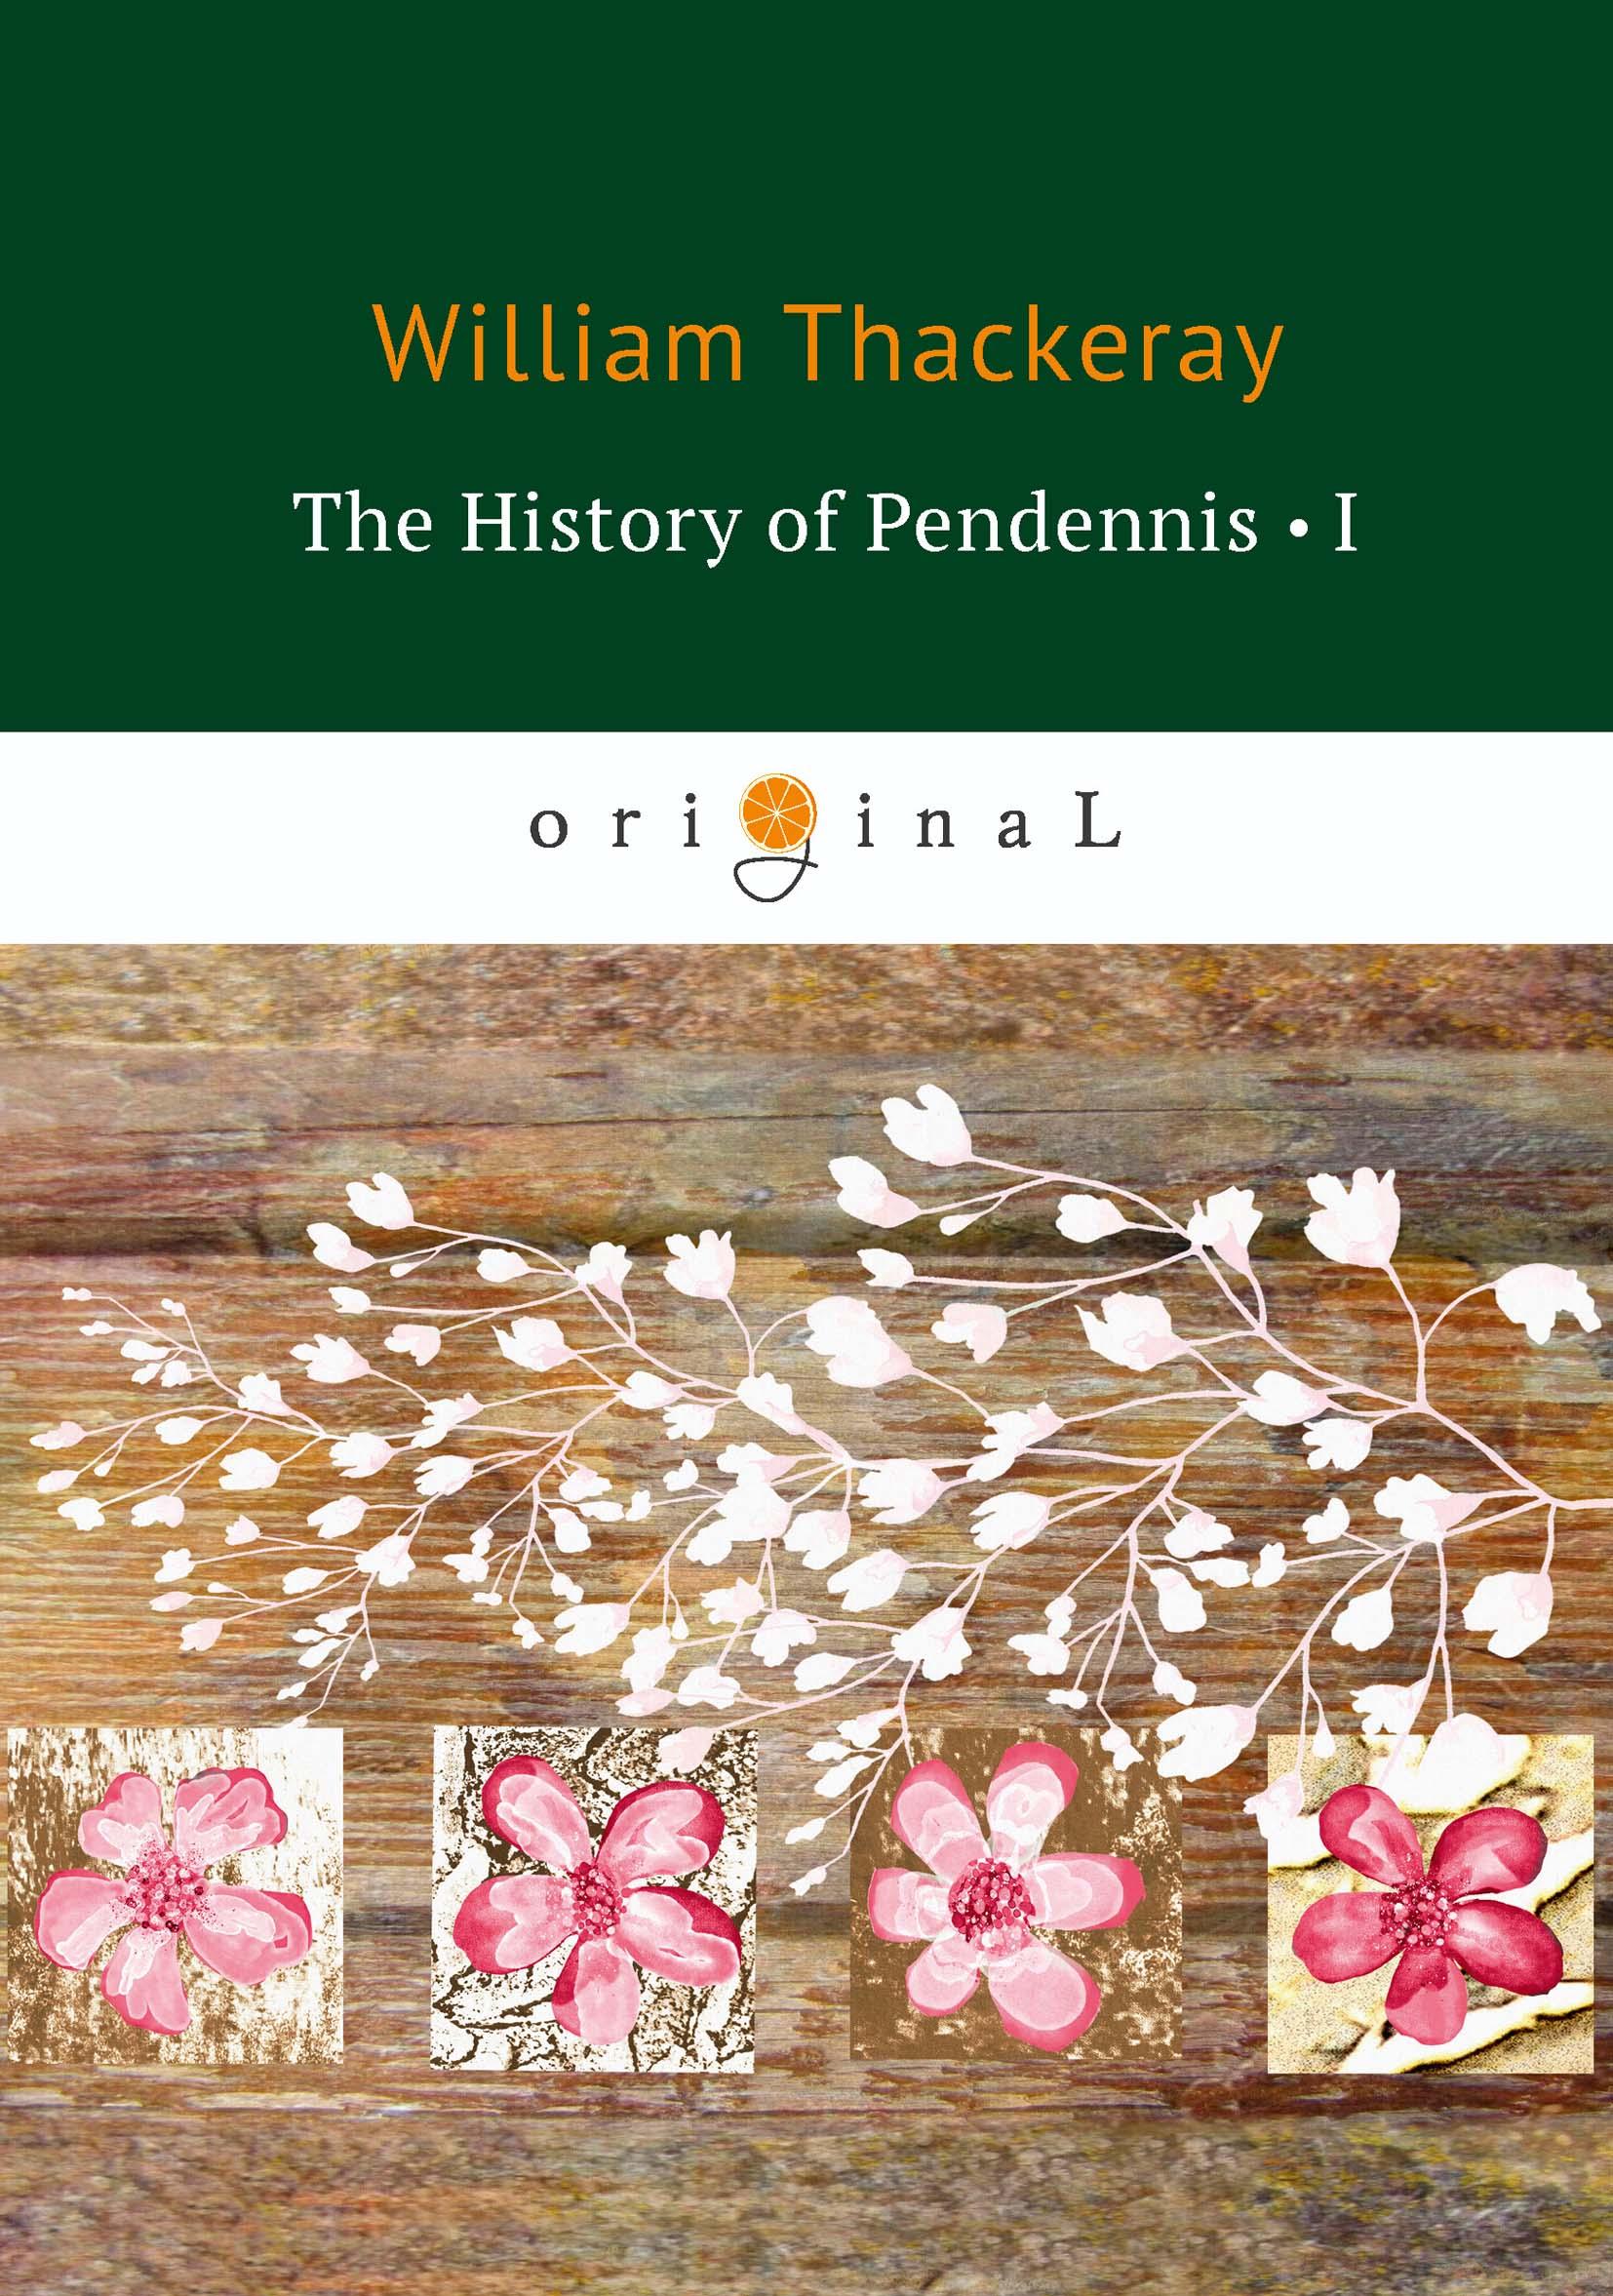 W. Thackeray The History of Pendennis I thackeray william makepeace the history of pendennis 2